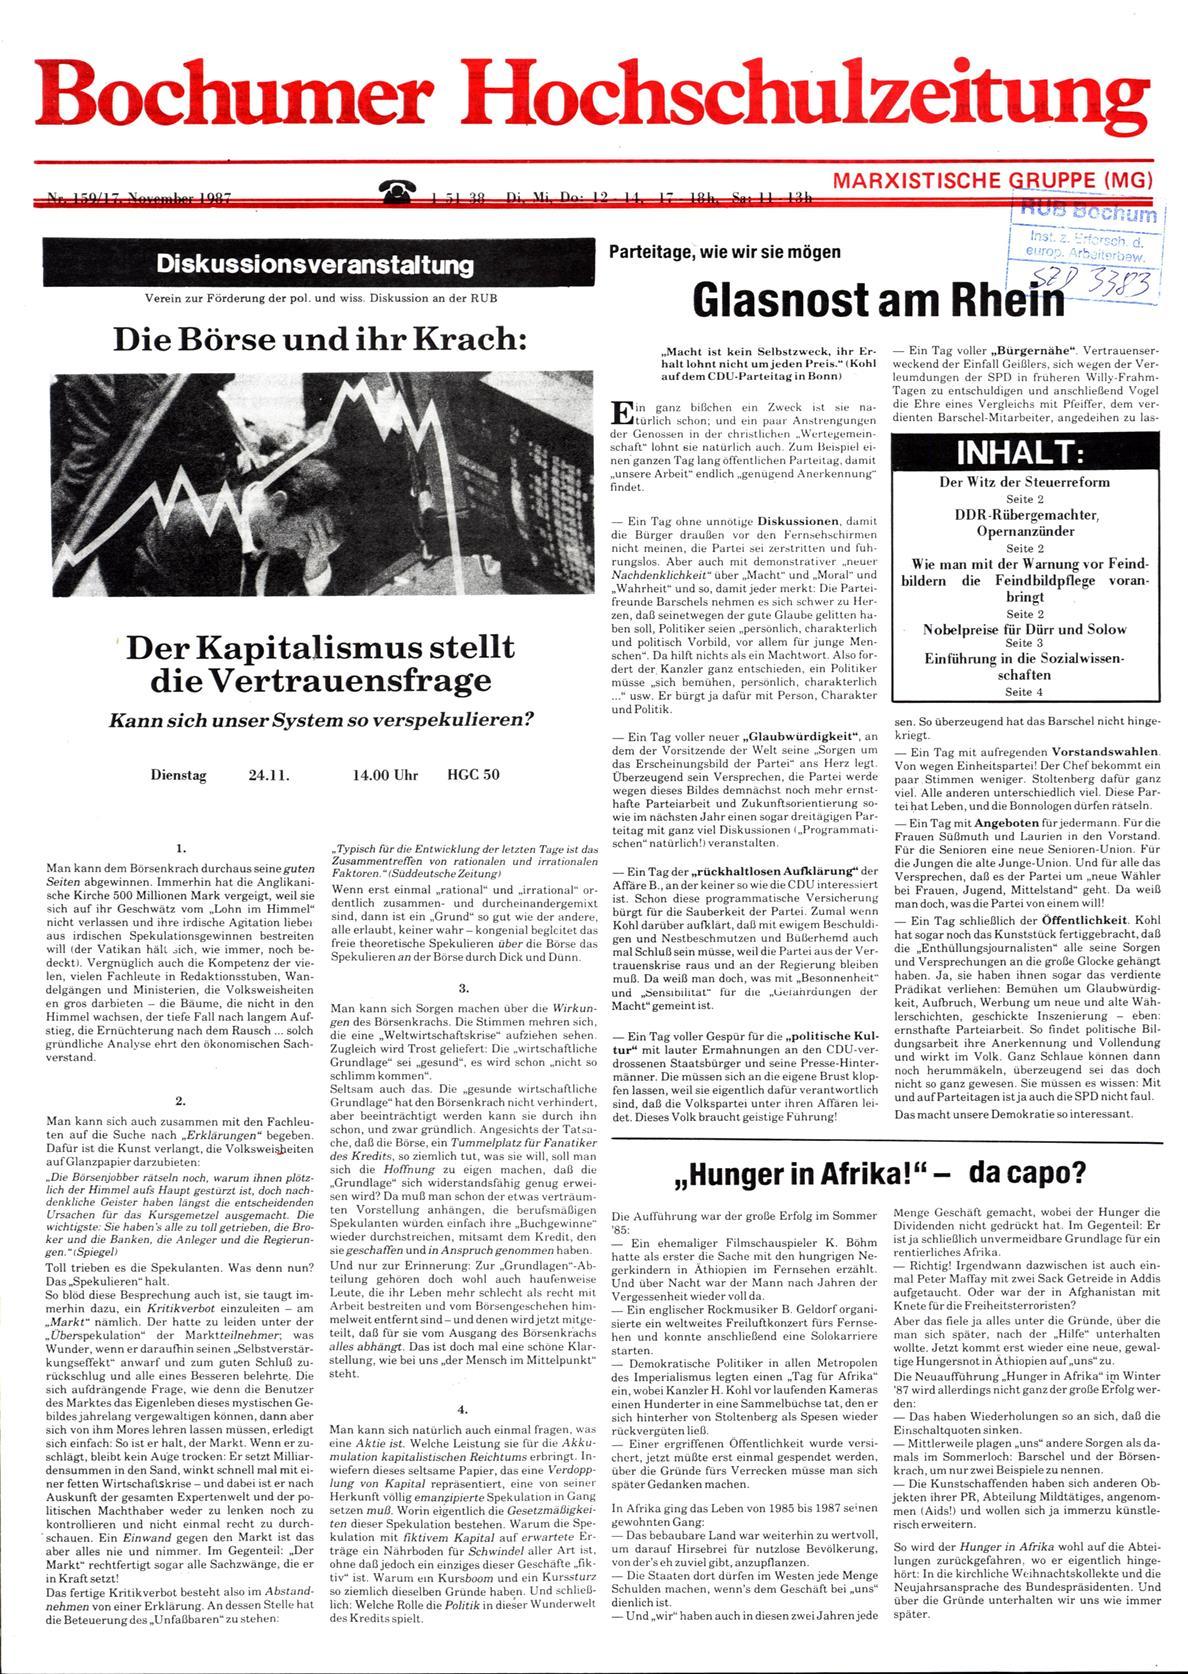 Bochum_BHZ_19871117_159_001